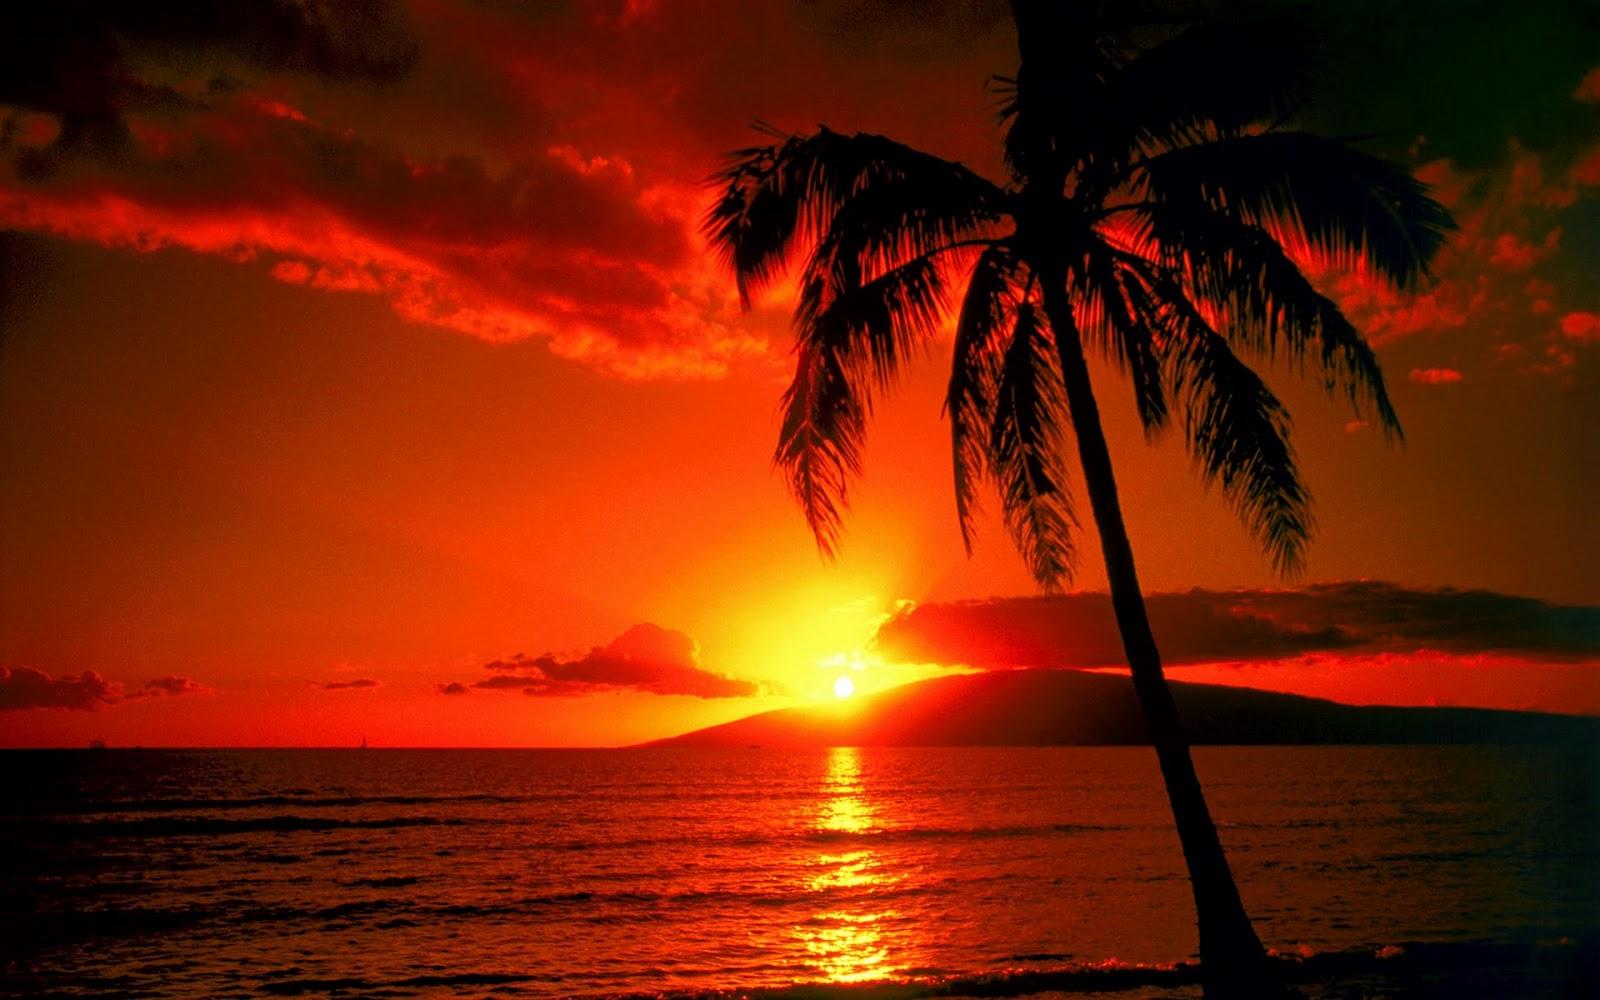 Mungkinkah  Matahari Terbit Dari Barat